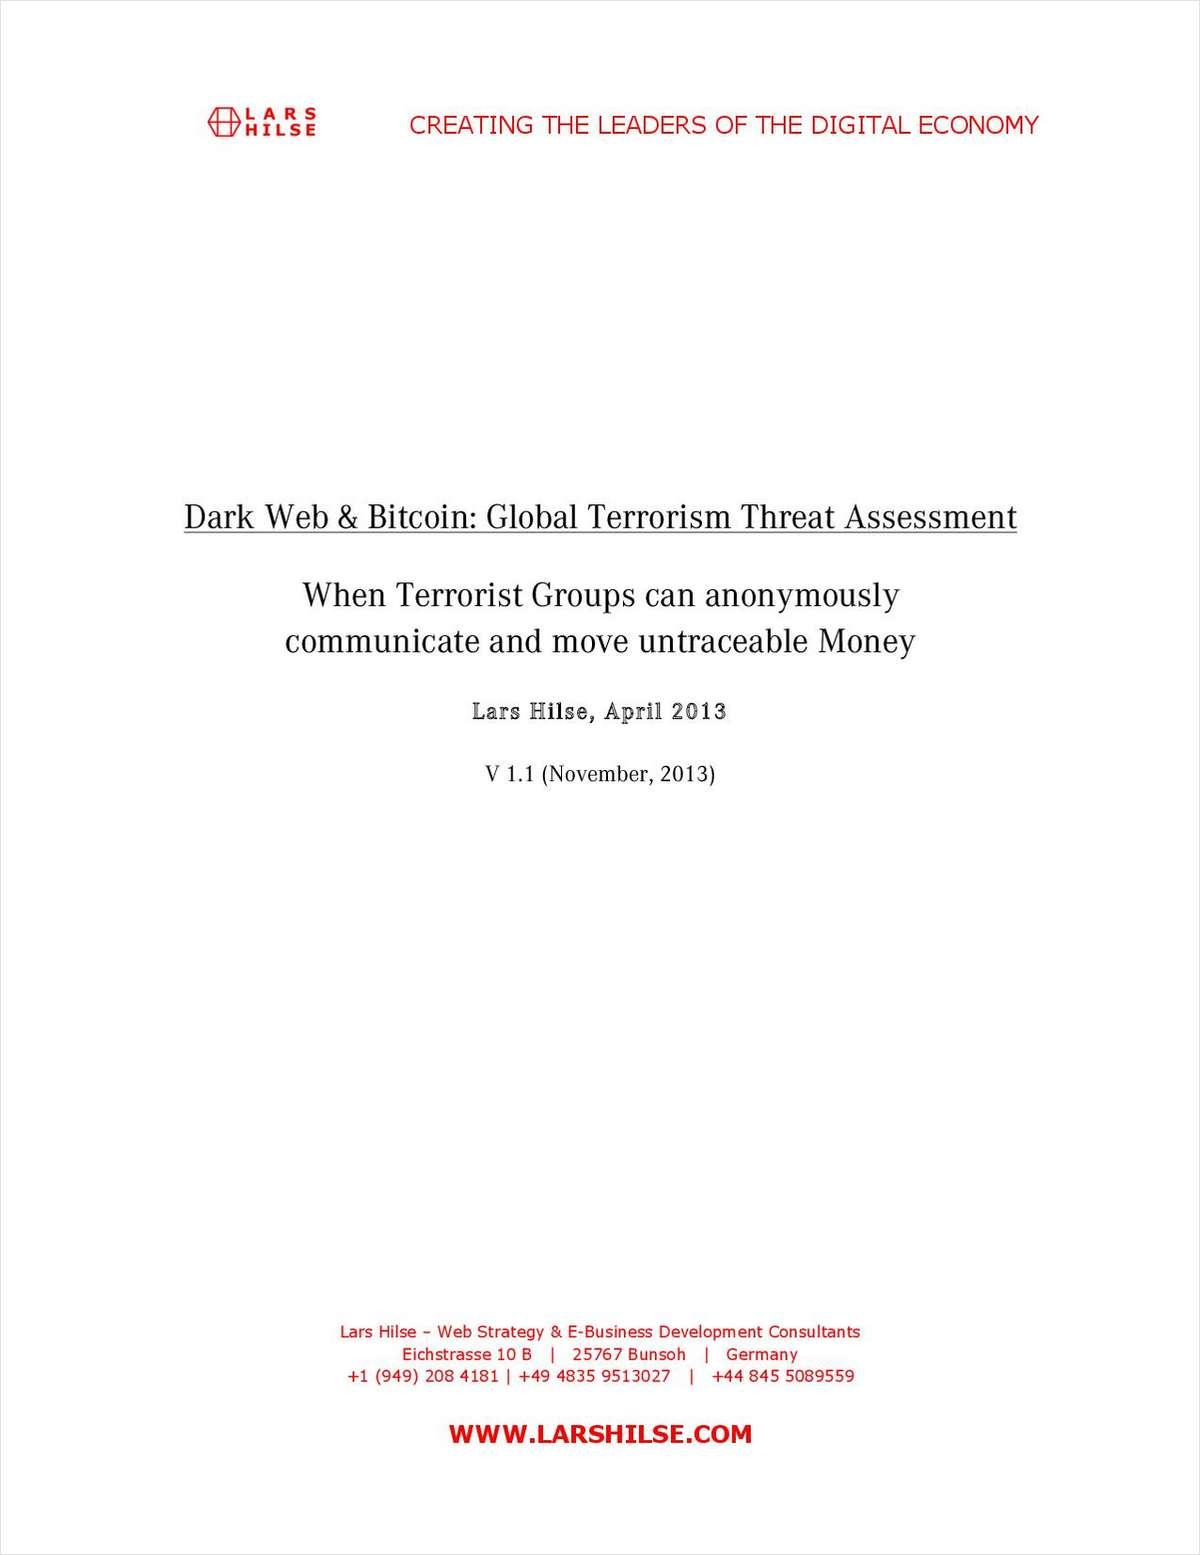 Dark Web & Bitcoin: Global Terrorism Threat Assessment